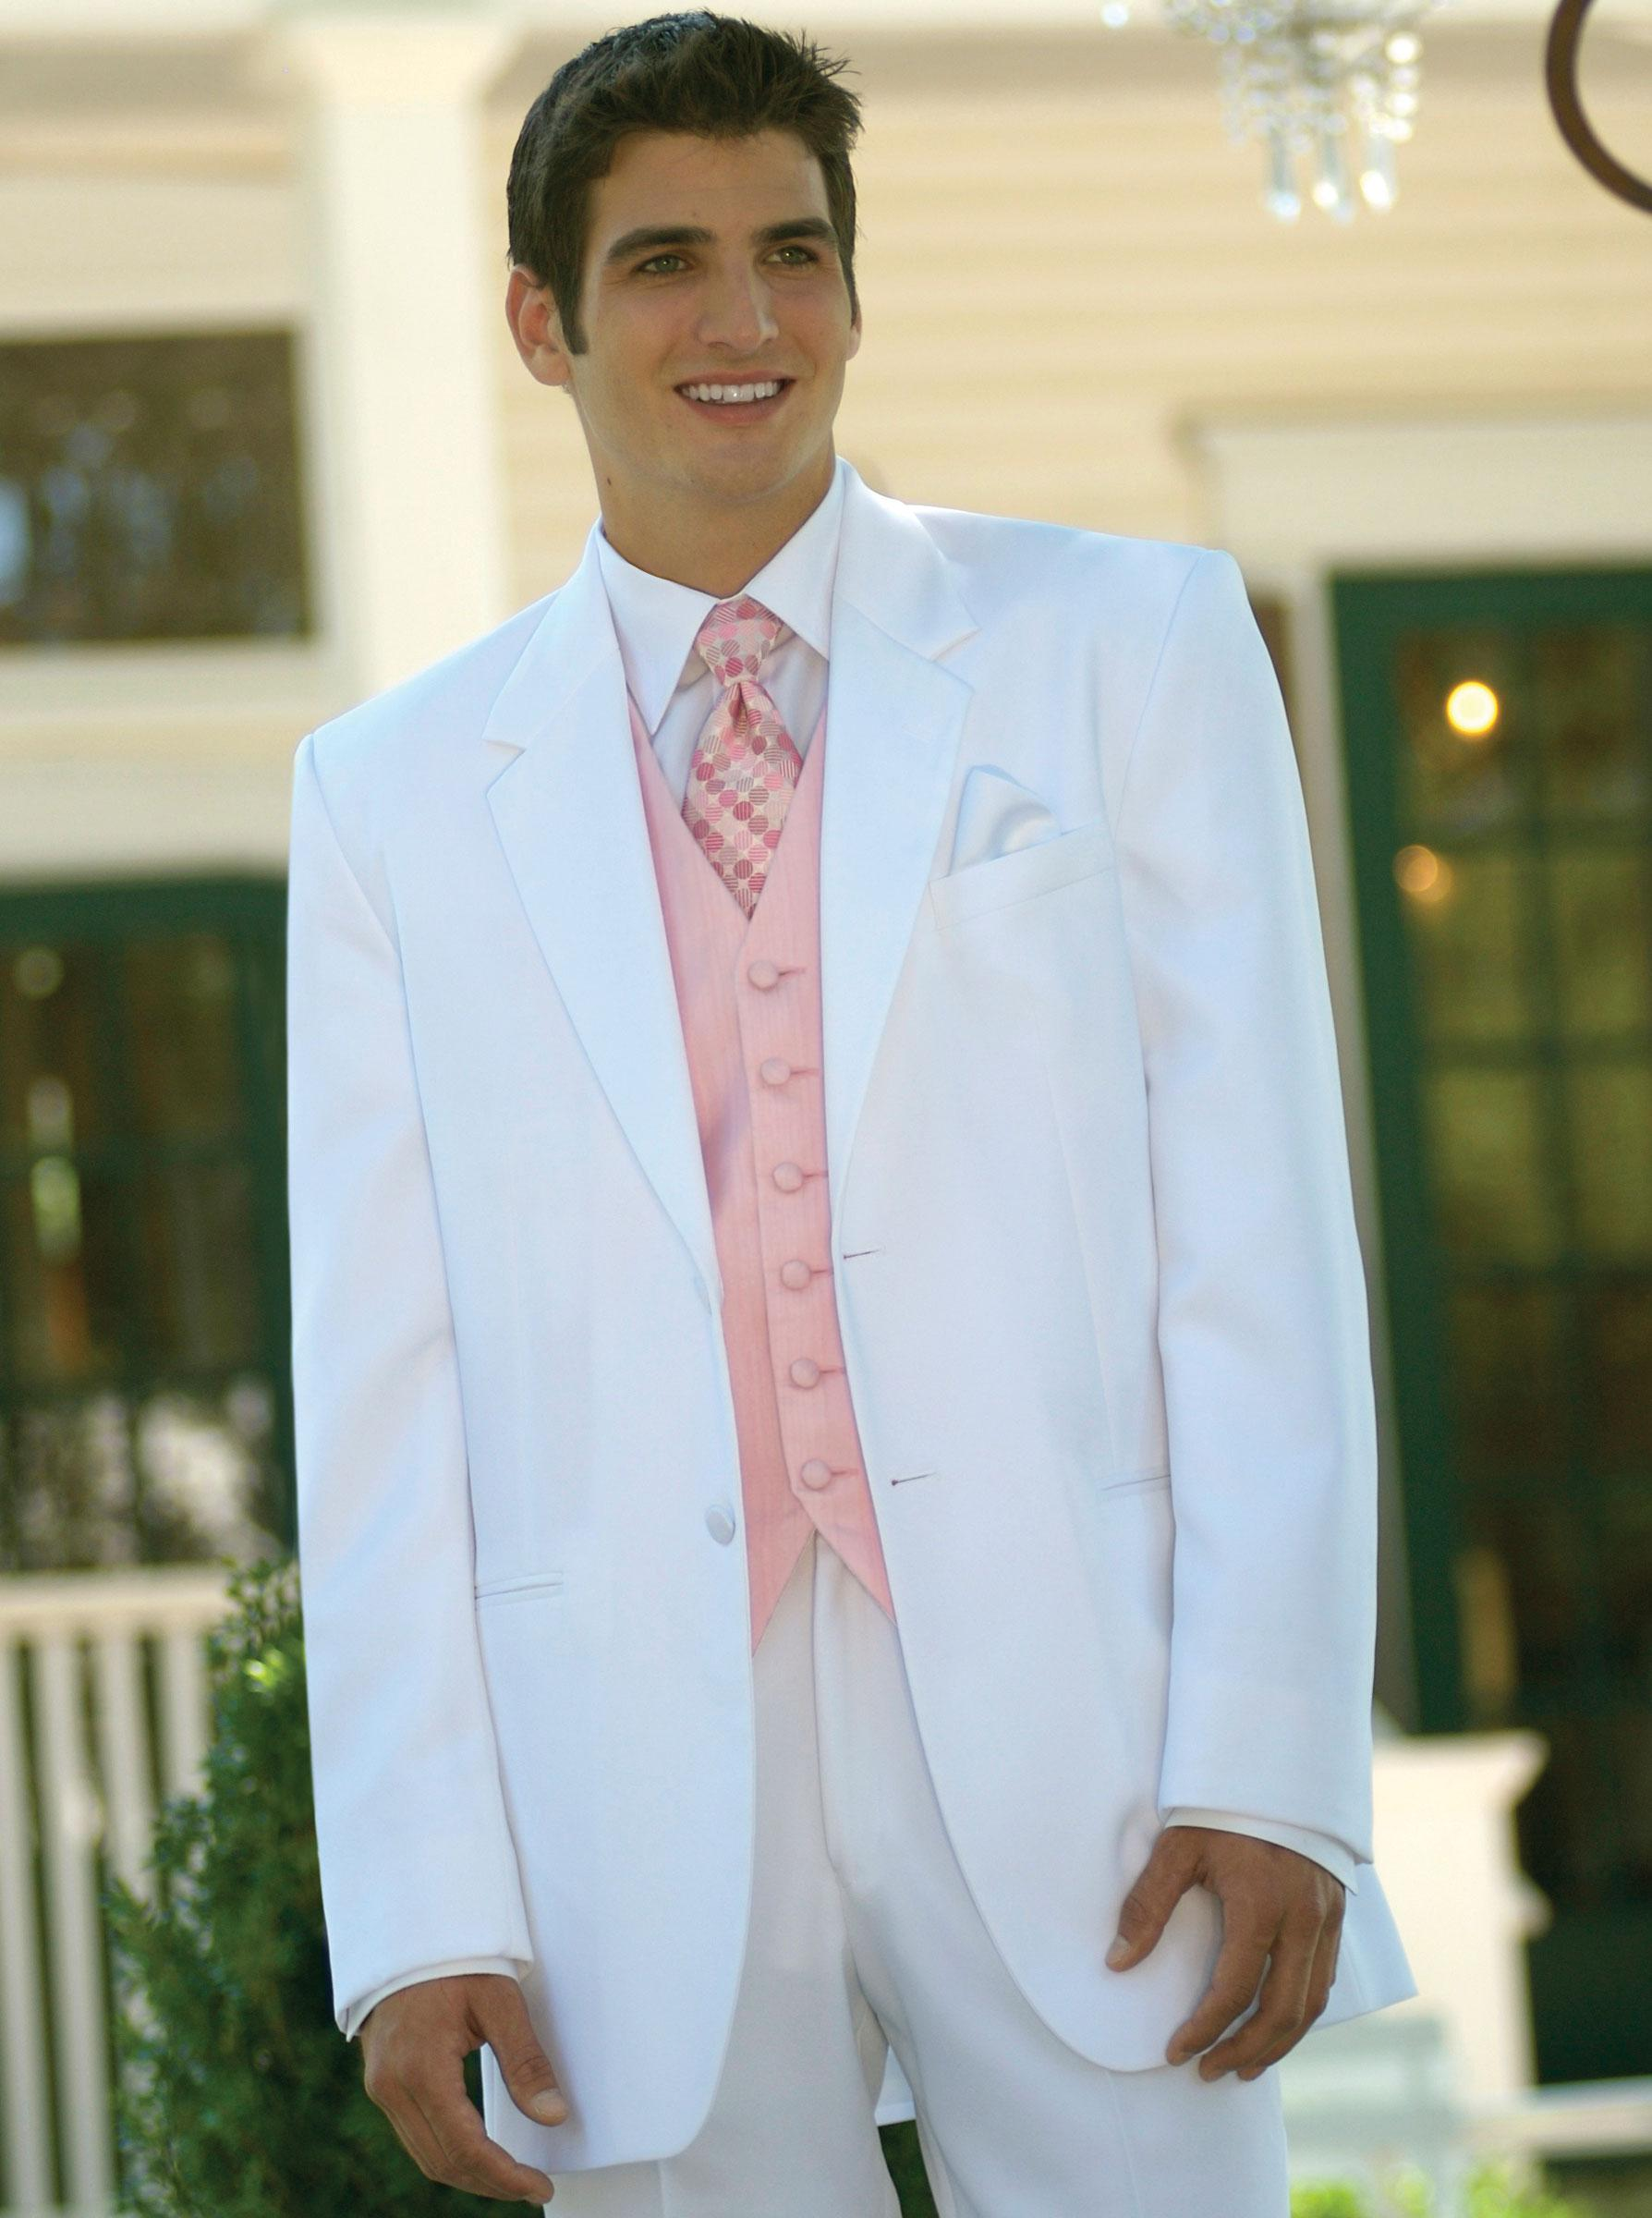 Mens Groom Wedding Suits Formal Wear 2017 Tailor Sit Slim Fit Men Tuxedo White Dinner